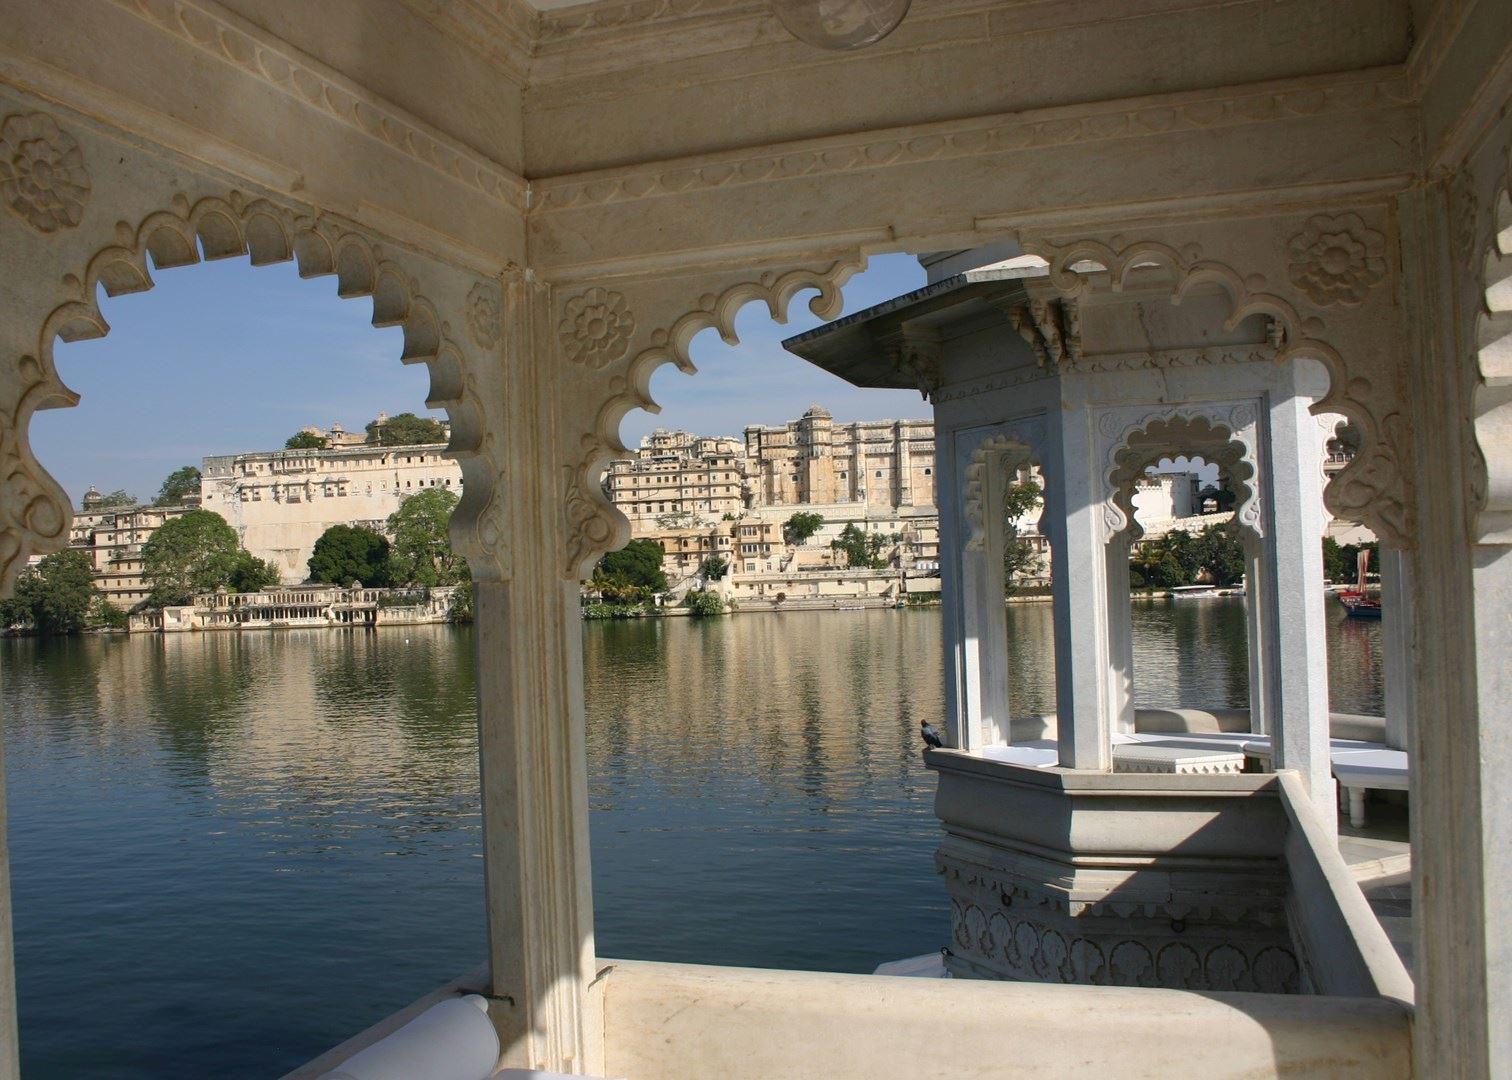 Taj lake palace pictures Top 8 Mistakes Seniors Make During Senior Portraits